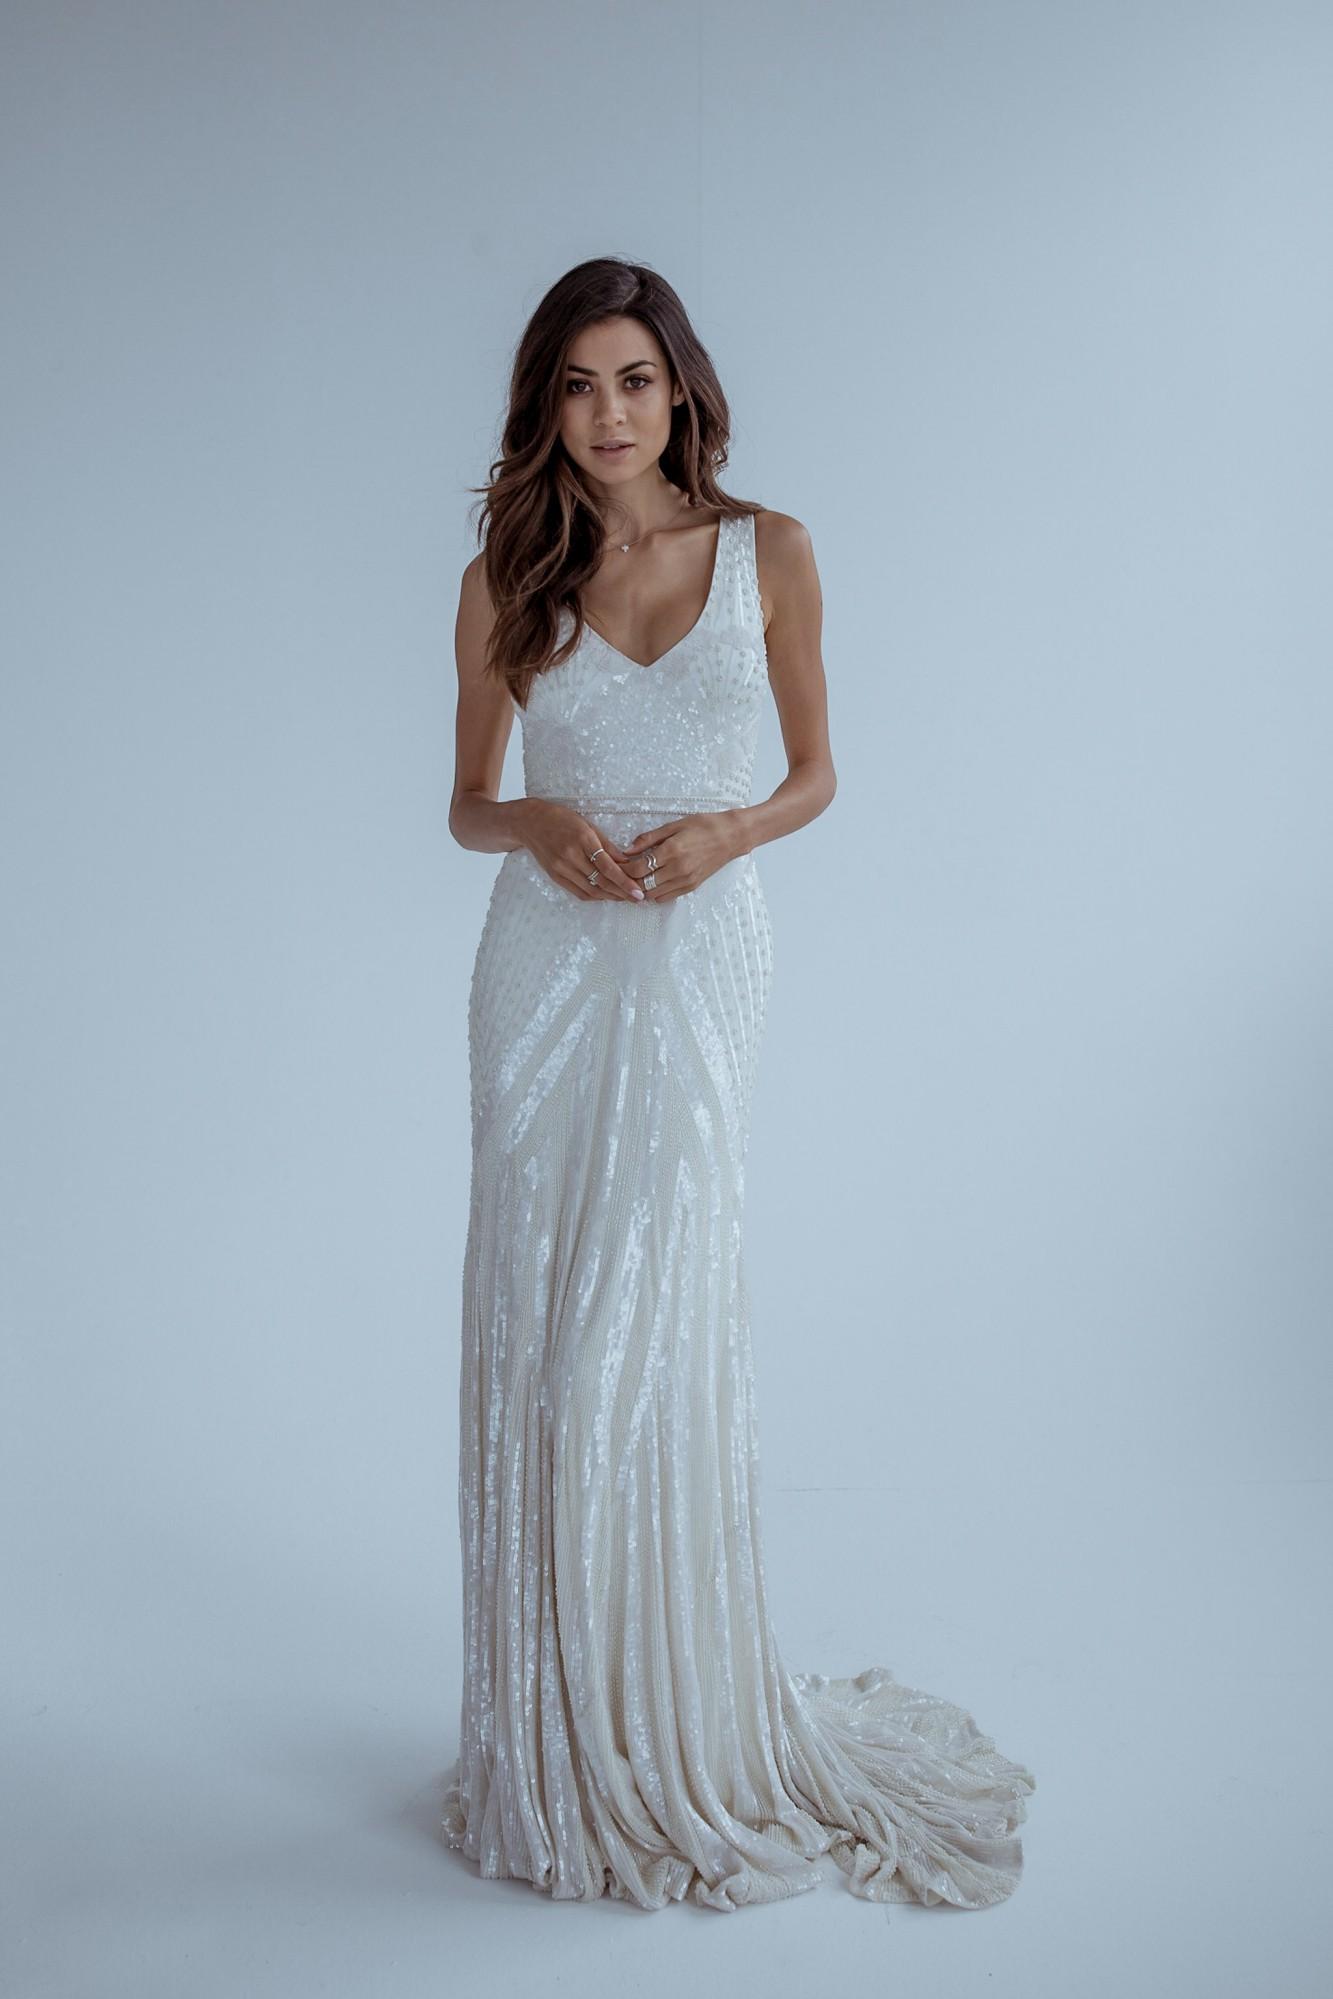 Unique Wedding Gowns Brisbane Component - All Wedding Dresses ...